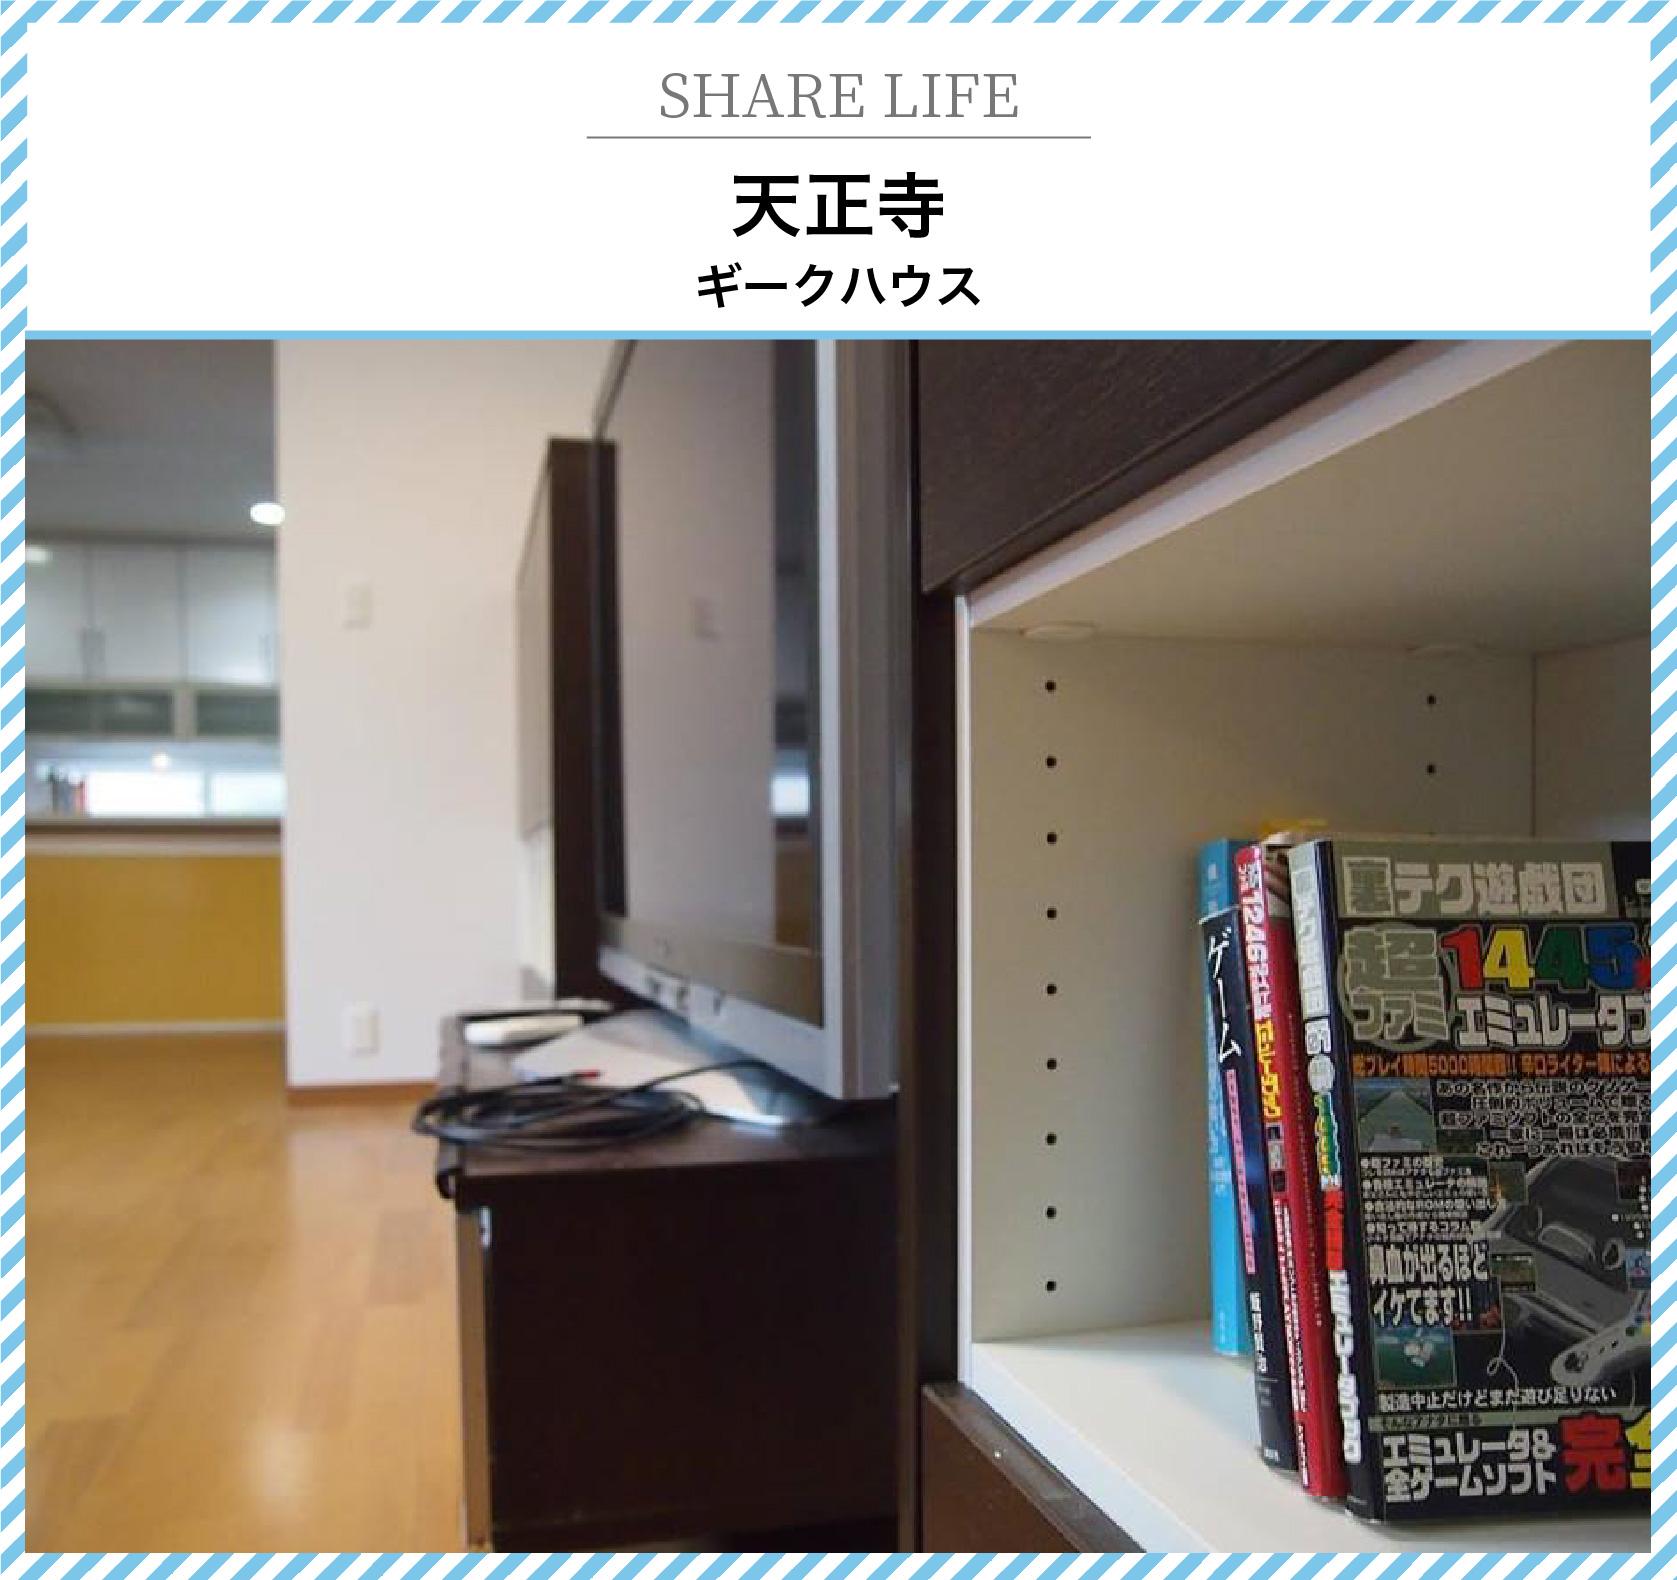 SHARE LIFE ギークハウス富山